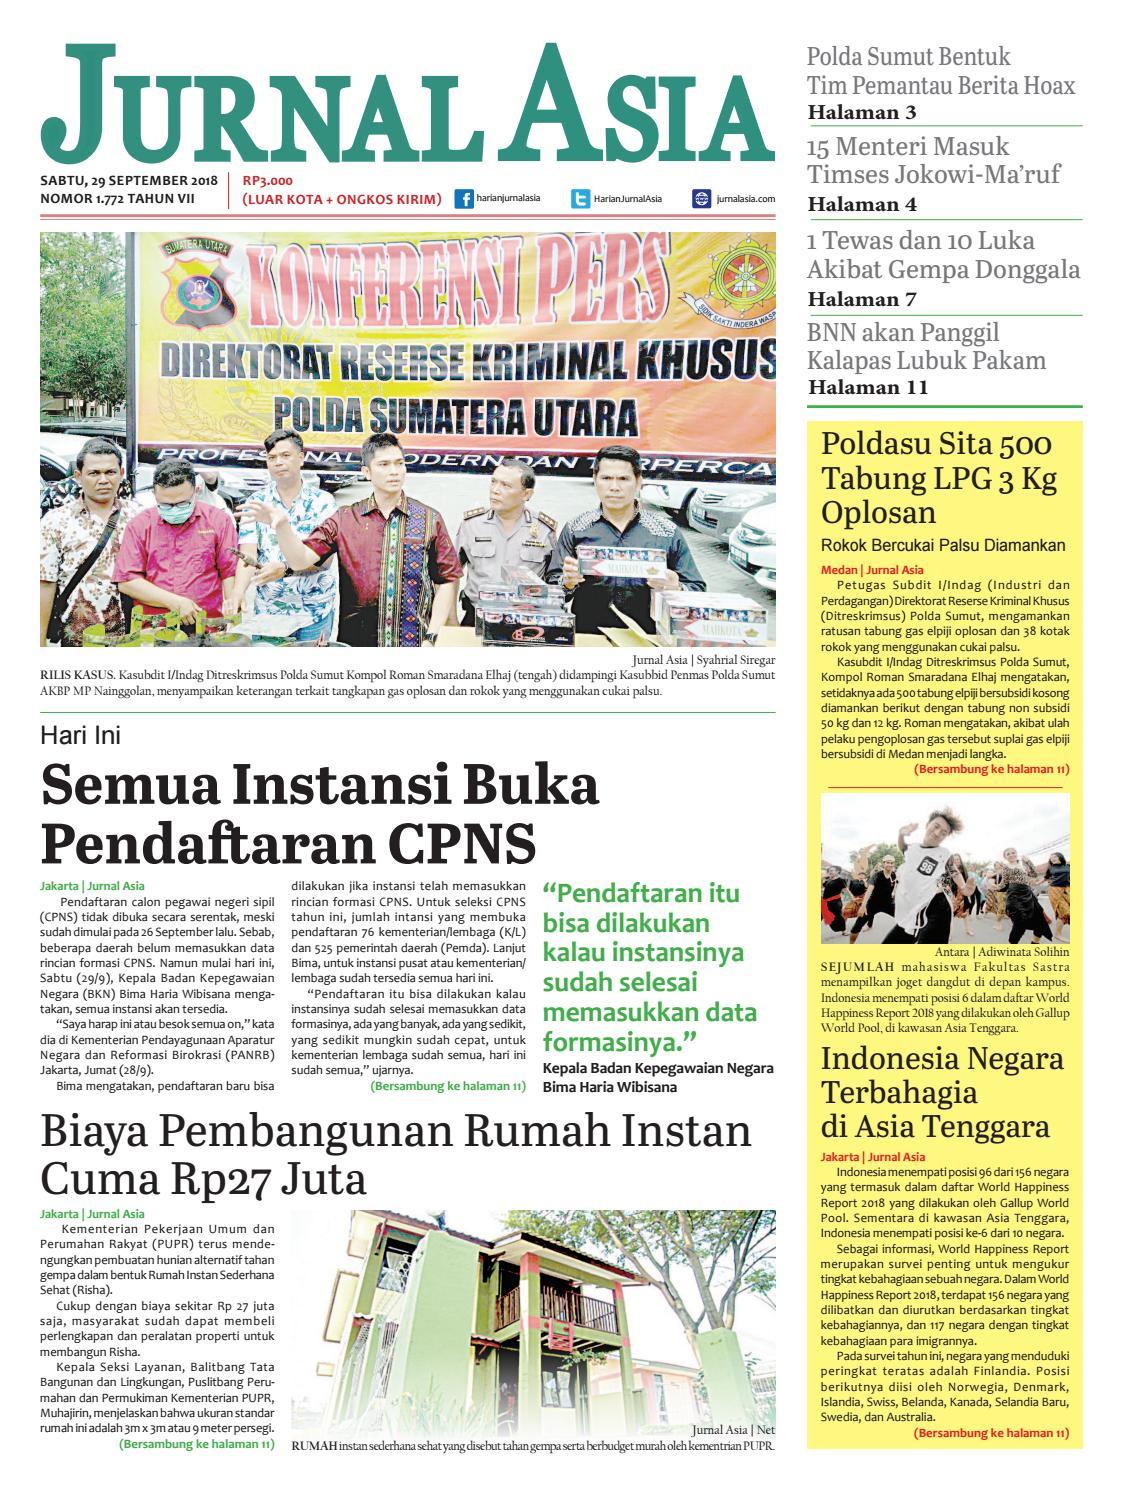 Harian Jurnal Asia Edisi Sabtu, 29 September 2018 by Harian Jurnal Asia - Medan - issuu